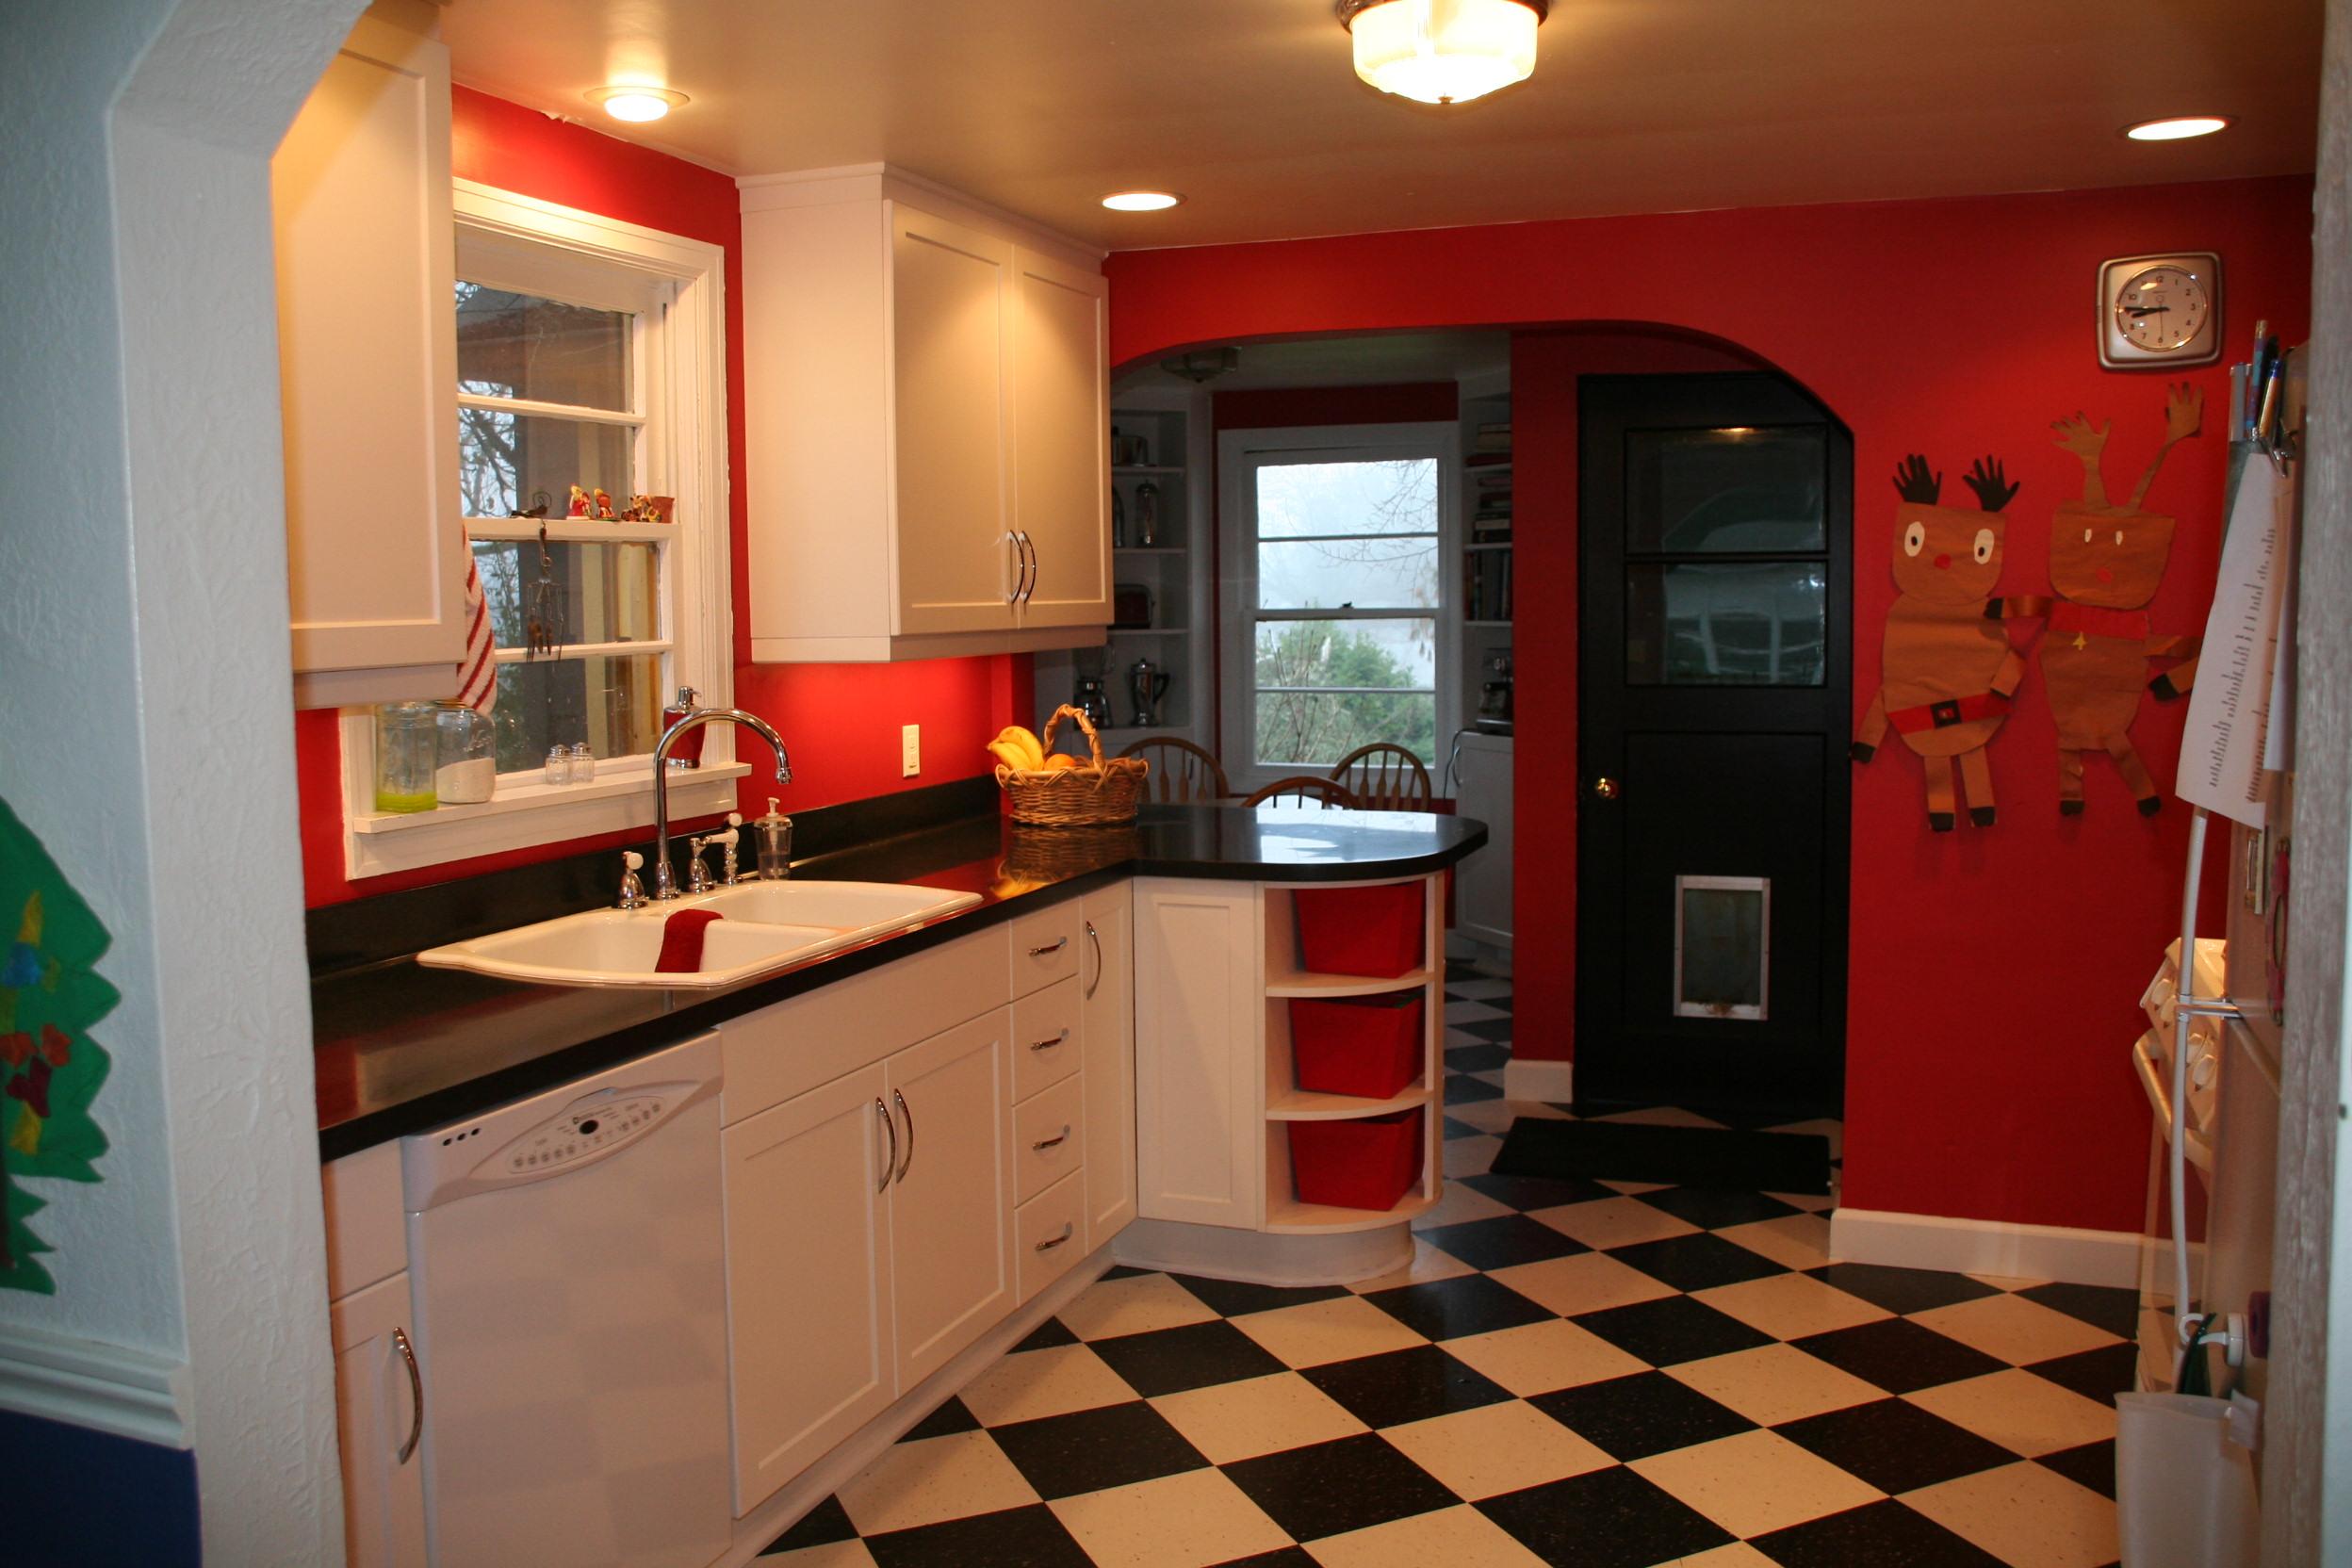 Kitchen & Bath Design By Pynne Luebbert At Coroflot.com